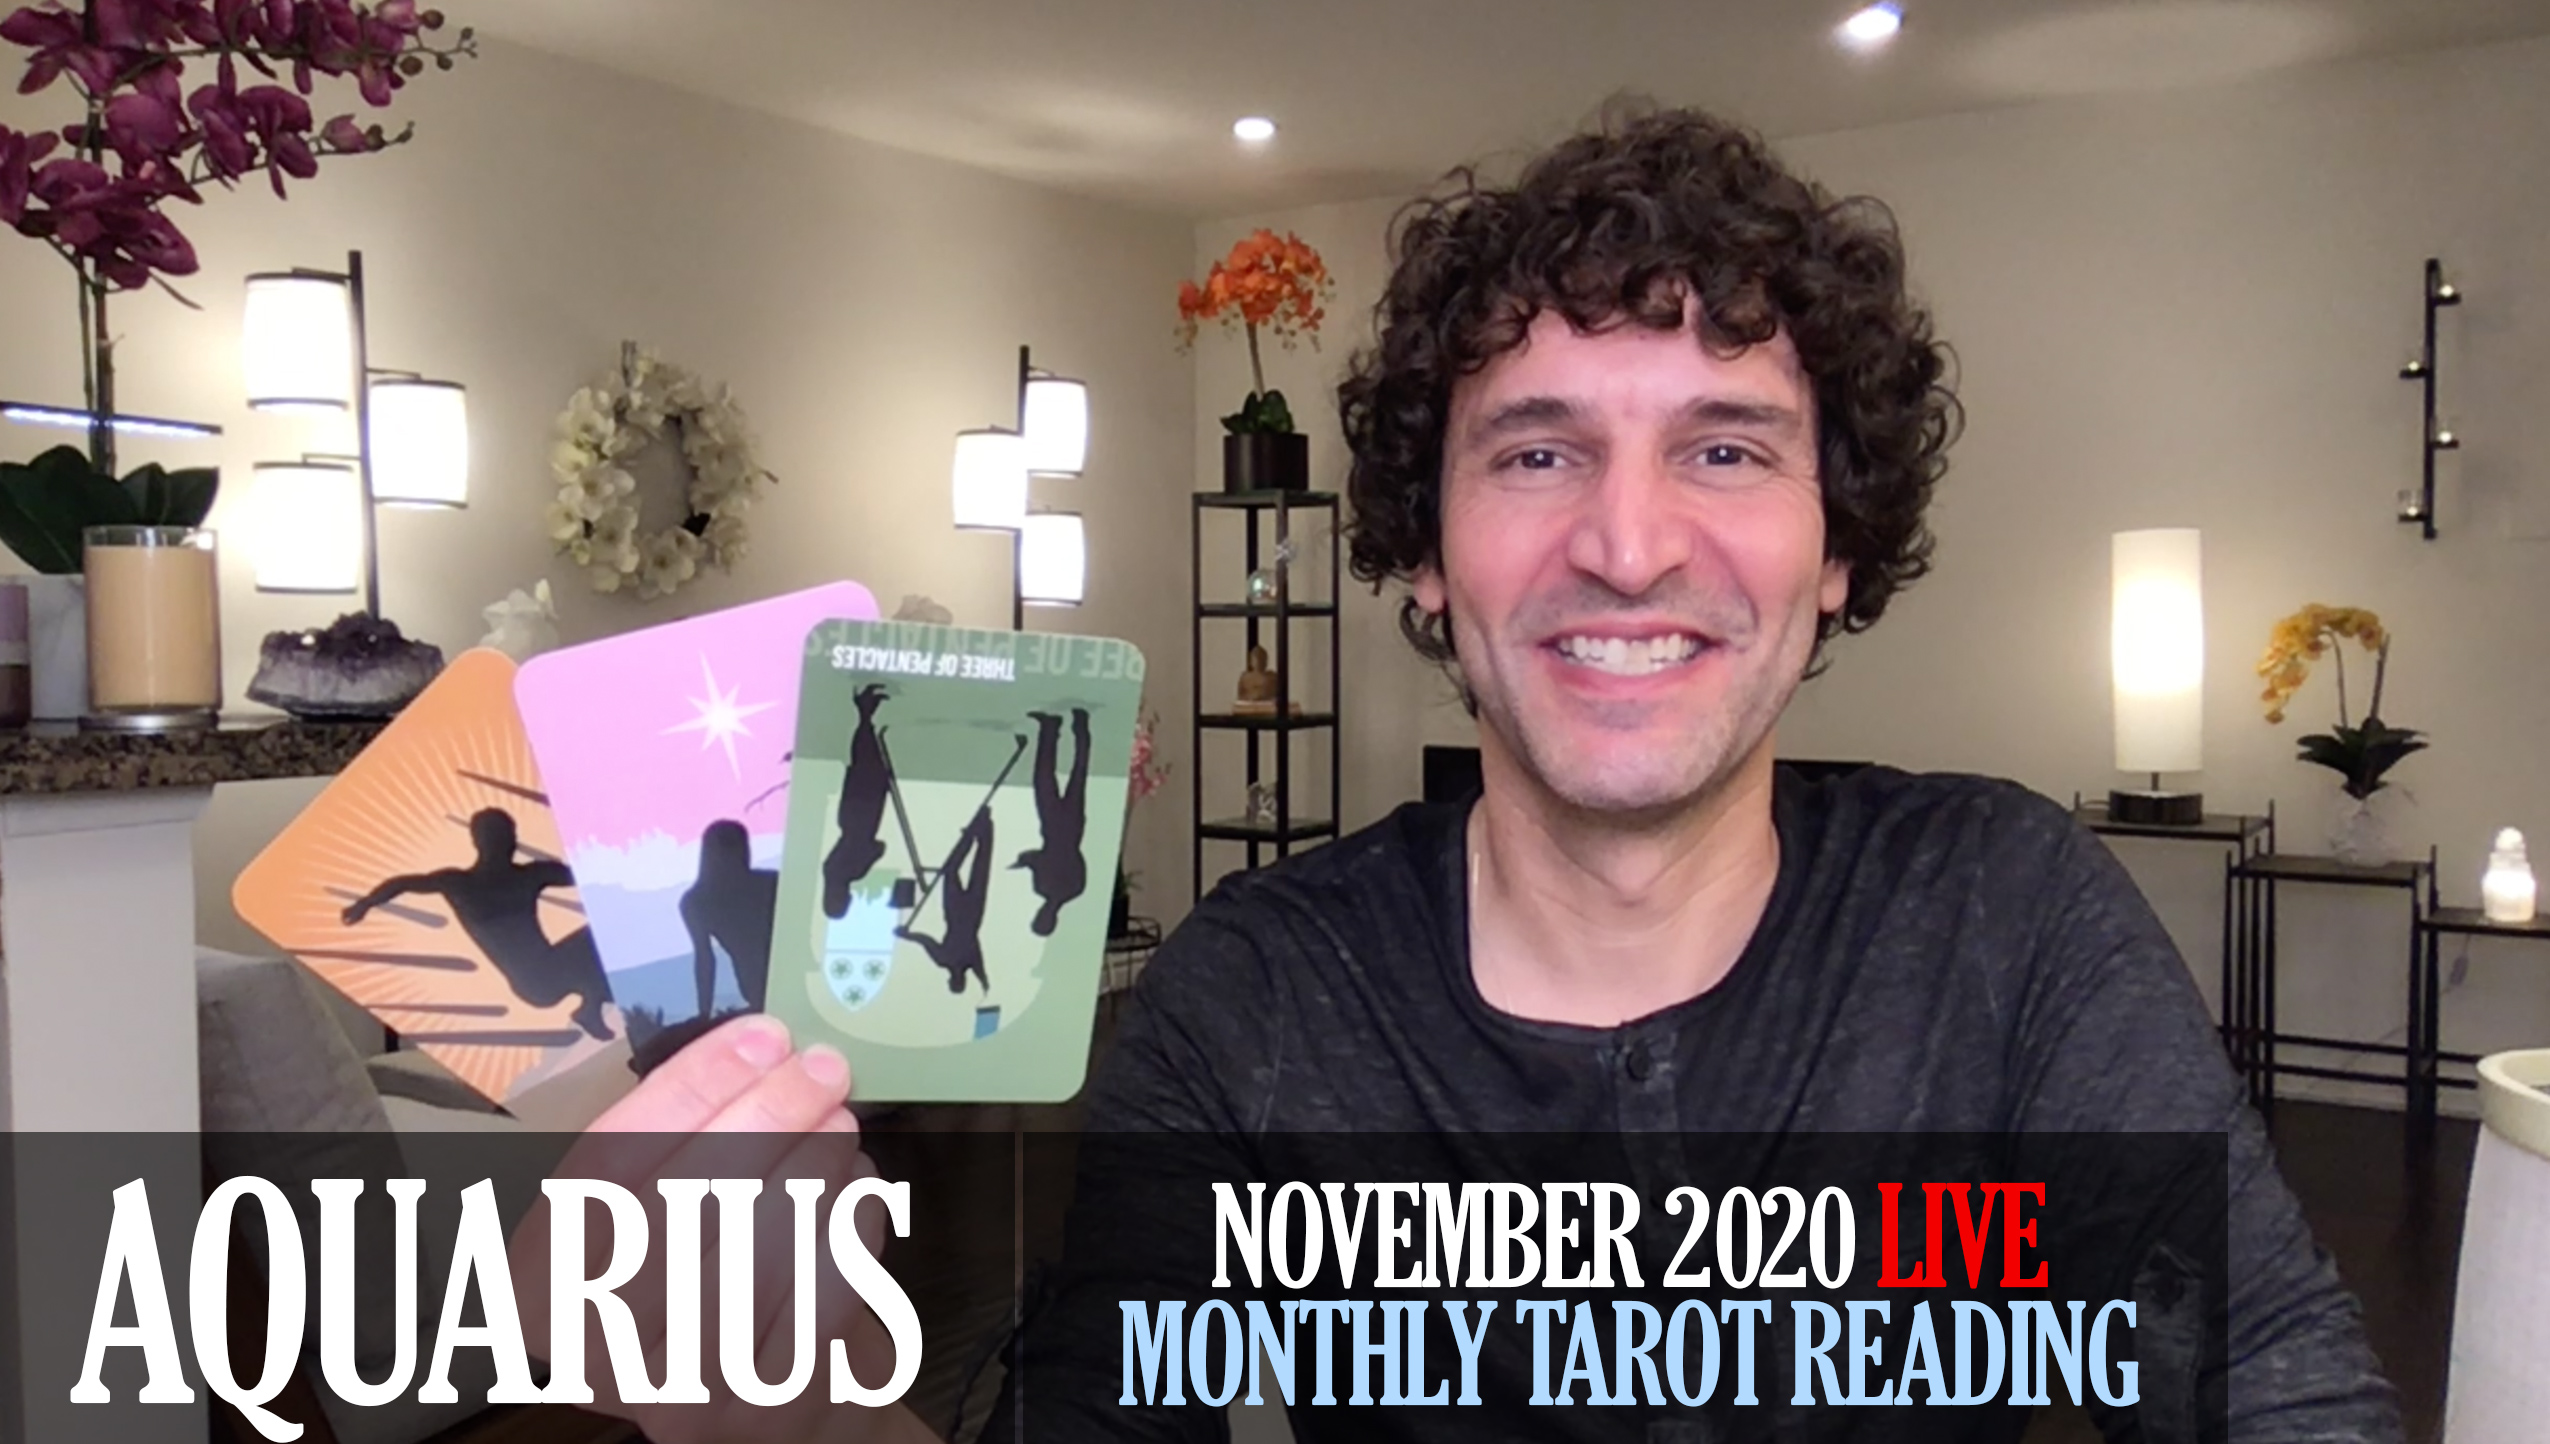 Aquarius November 2020